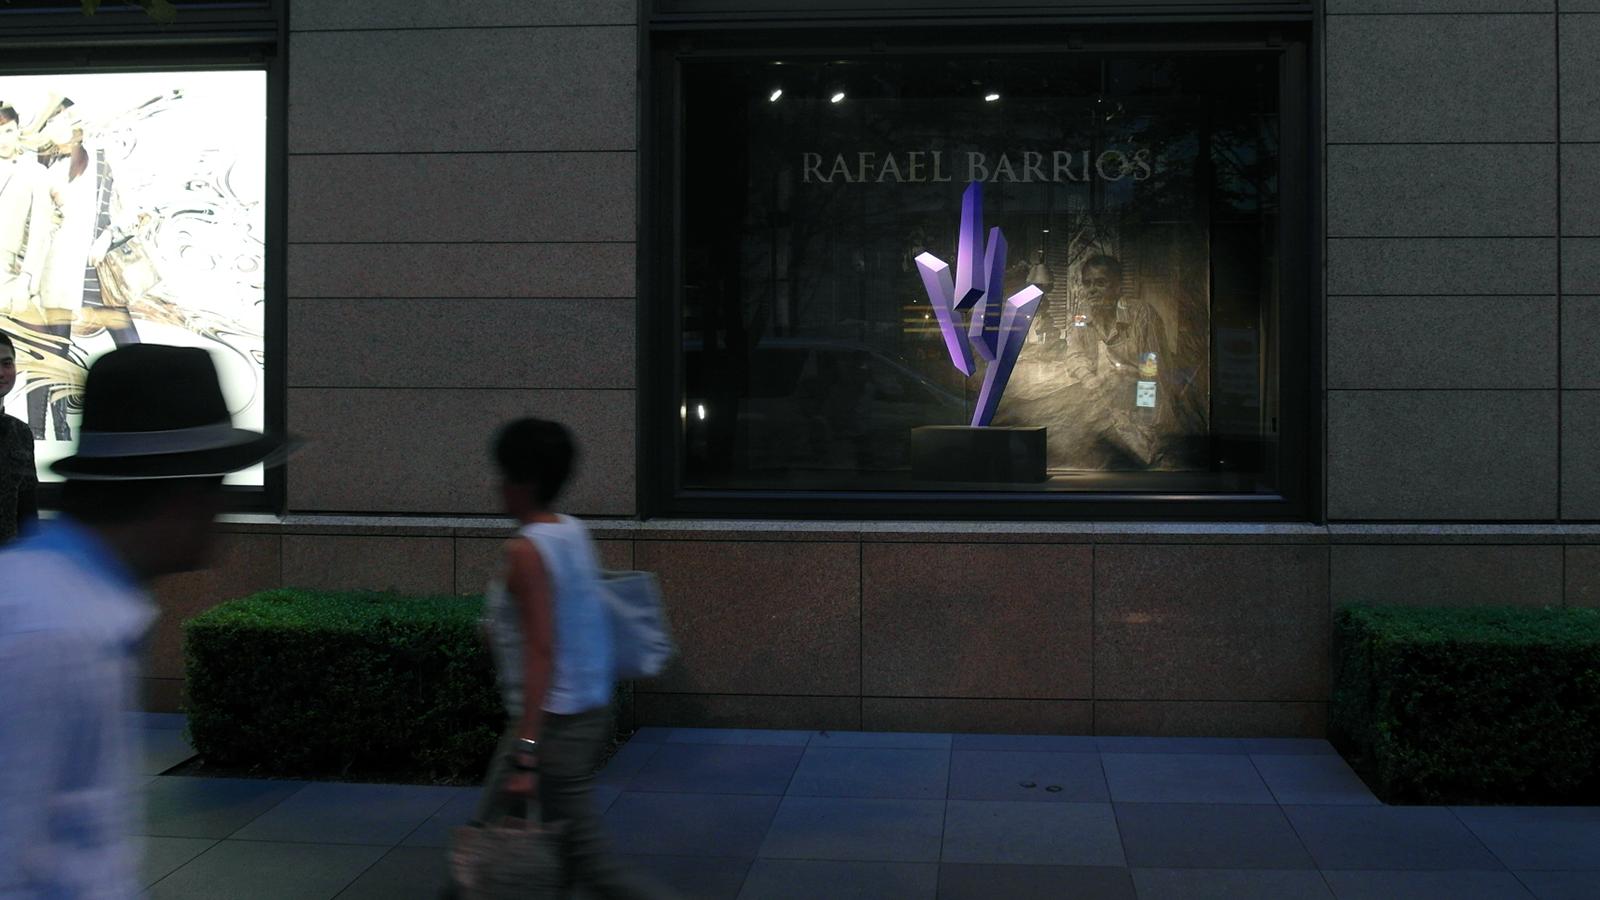 Rafael Barrios Art Window 2